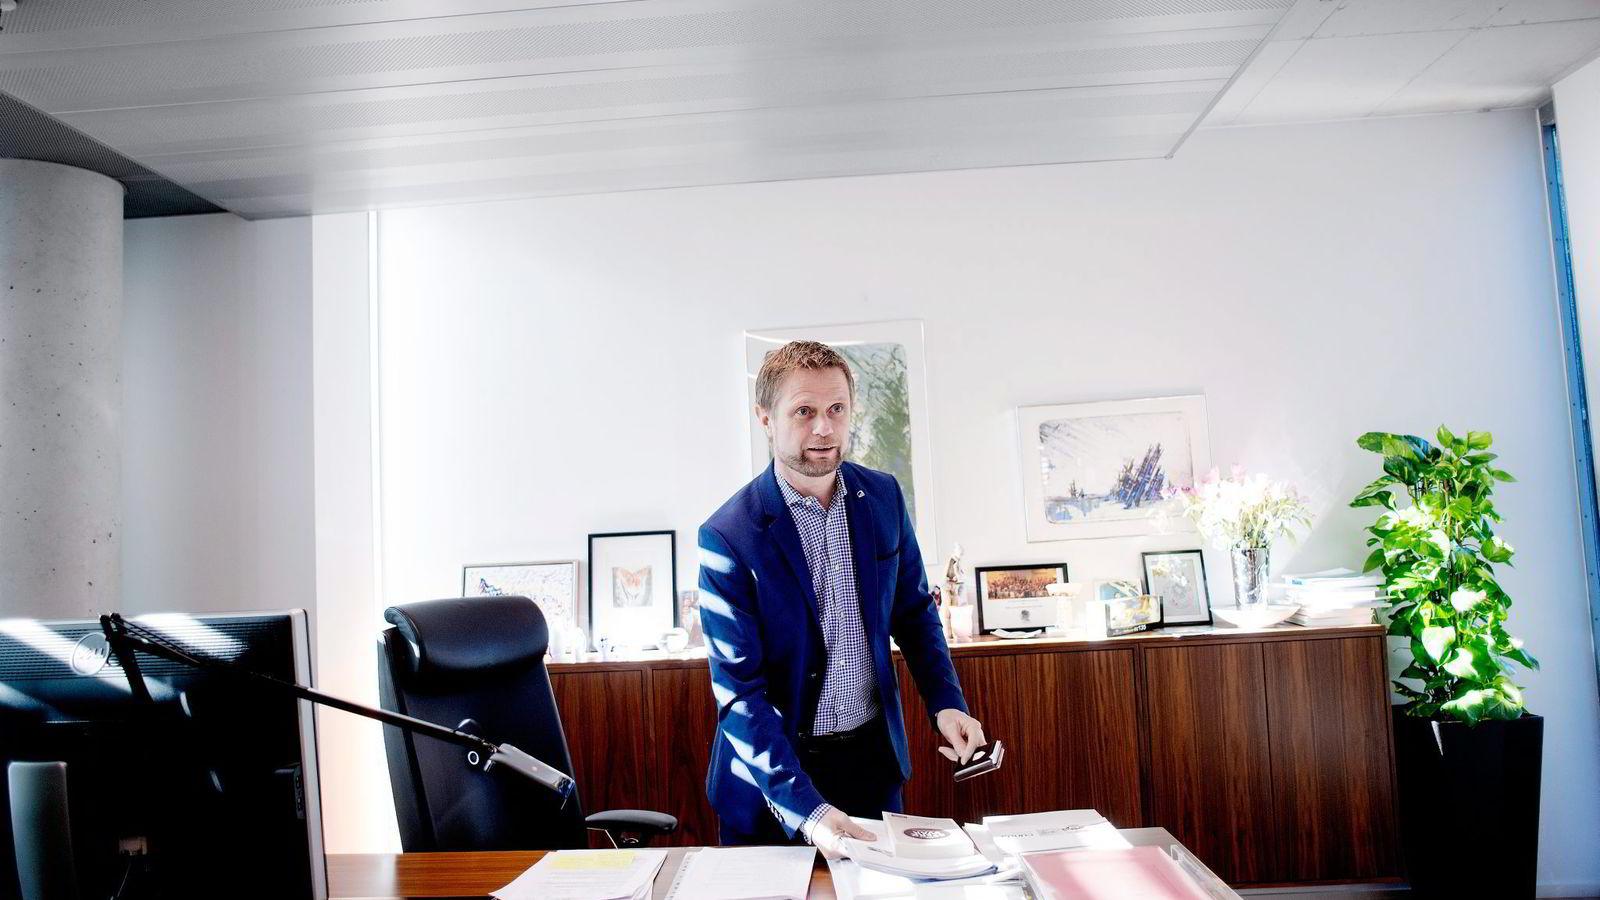 Det er ingen lege som vil være fastlege som ikke kan få en praksis gratis, sier helseminister Bent Høie.